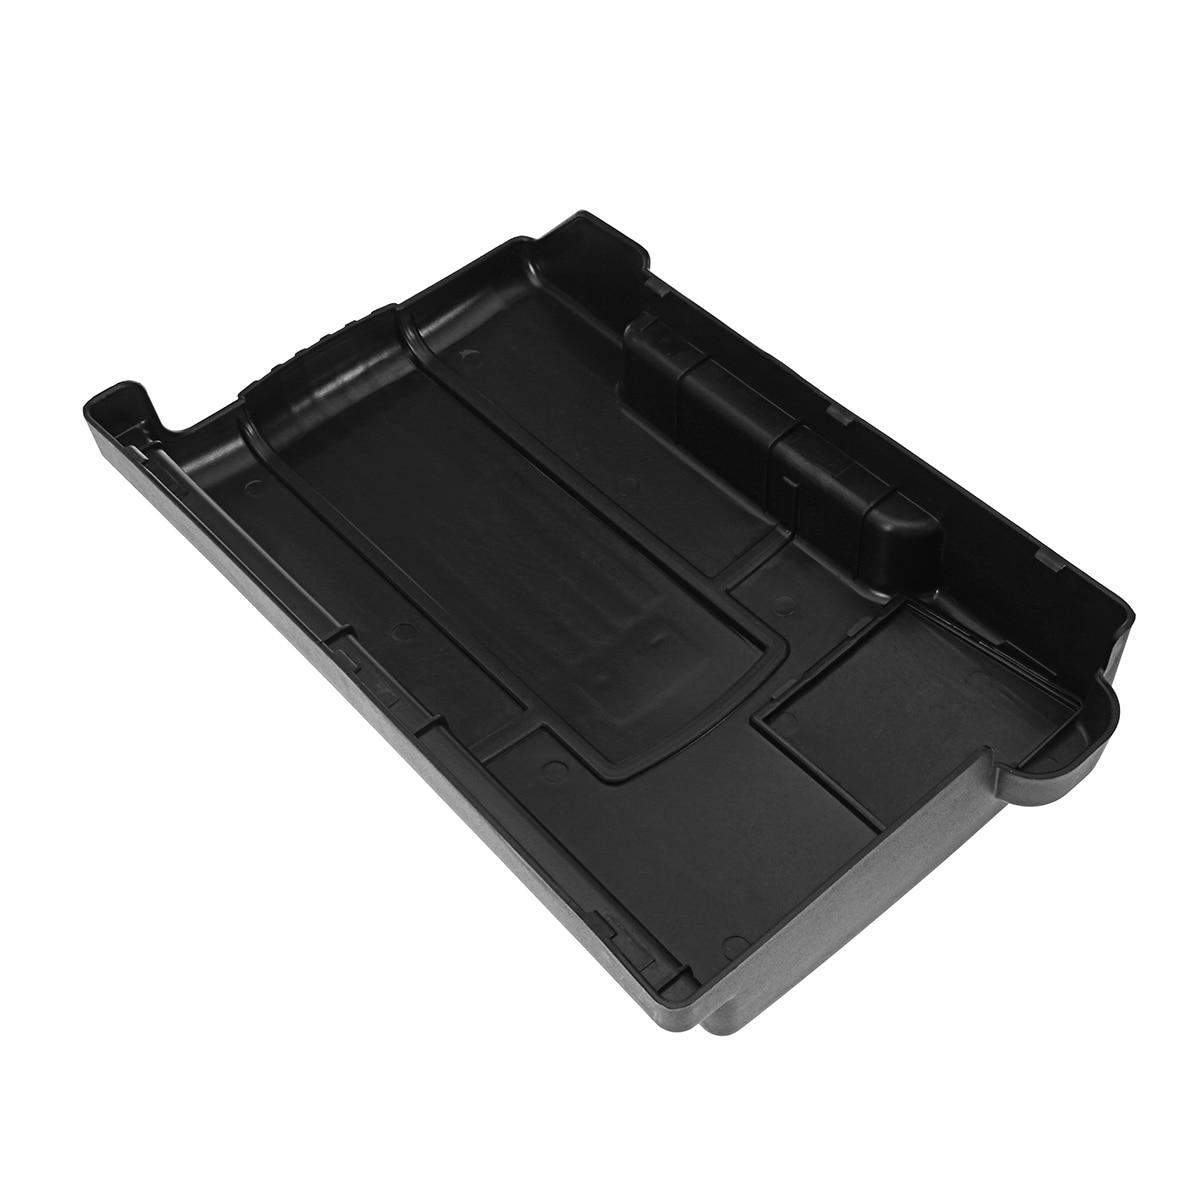 capa protetora para bateria de motor capa 04